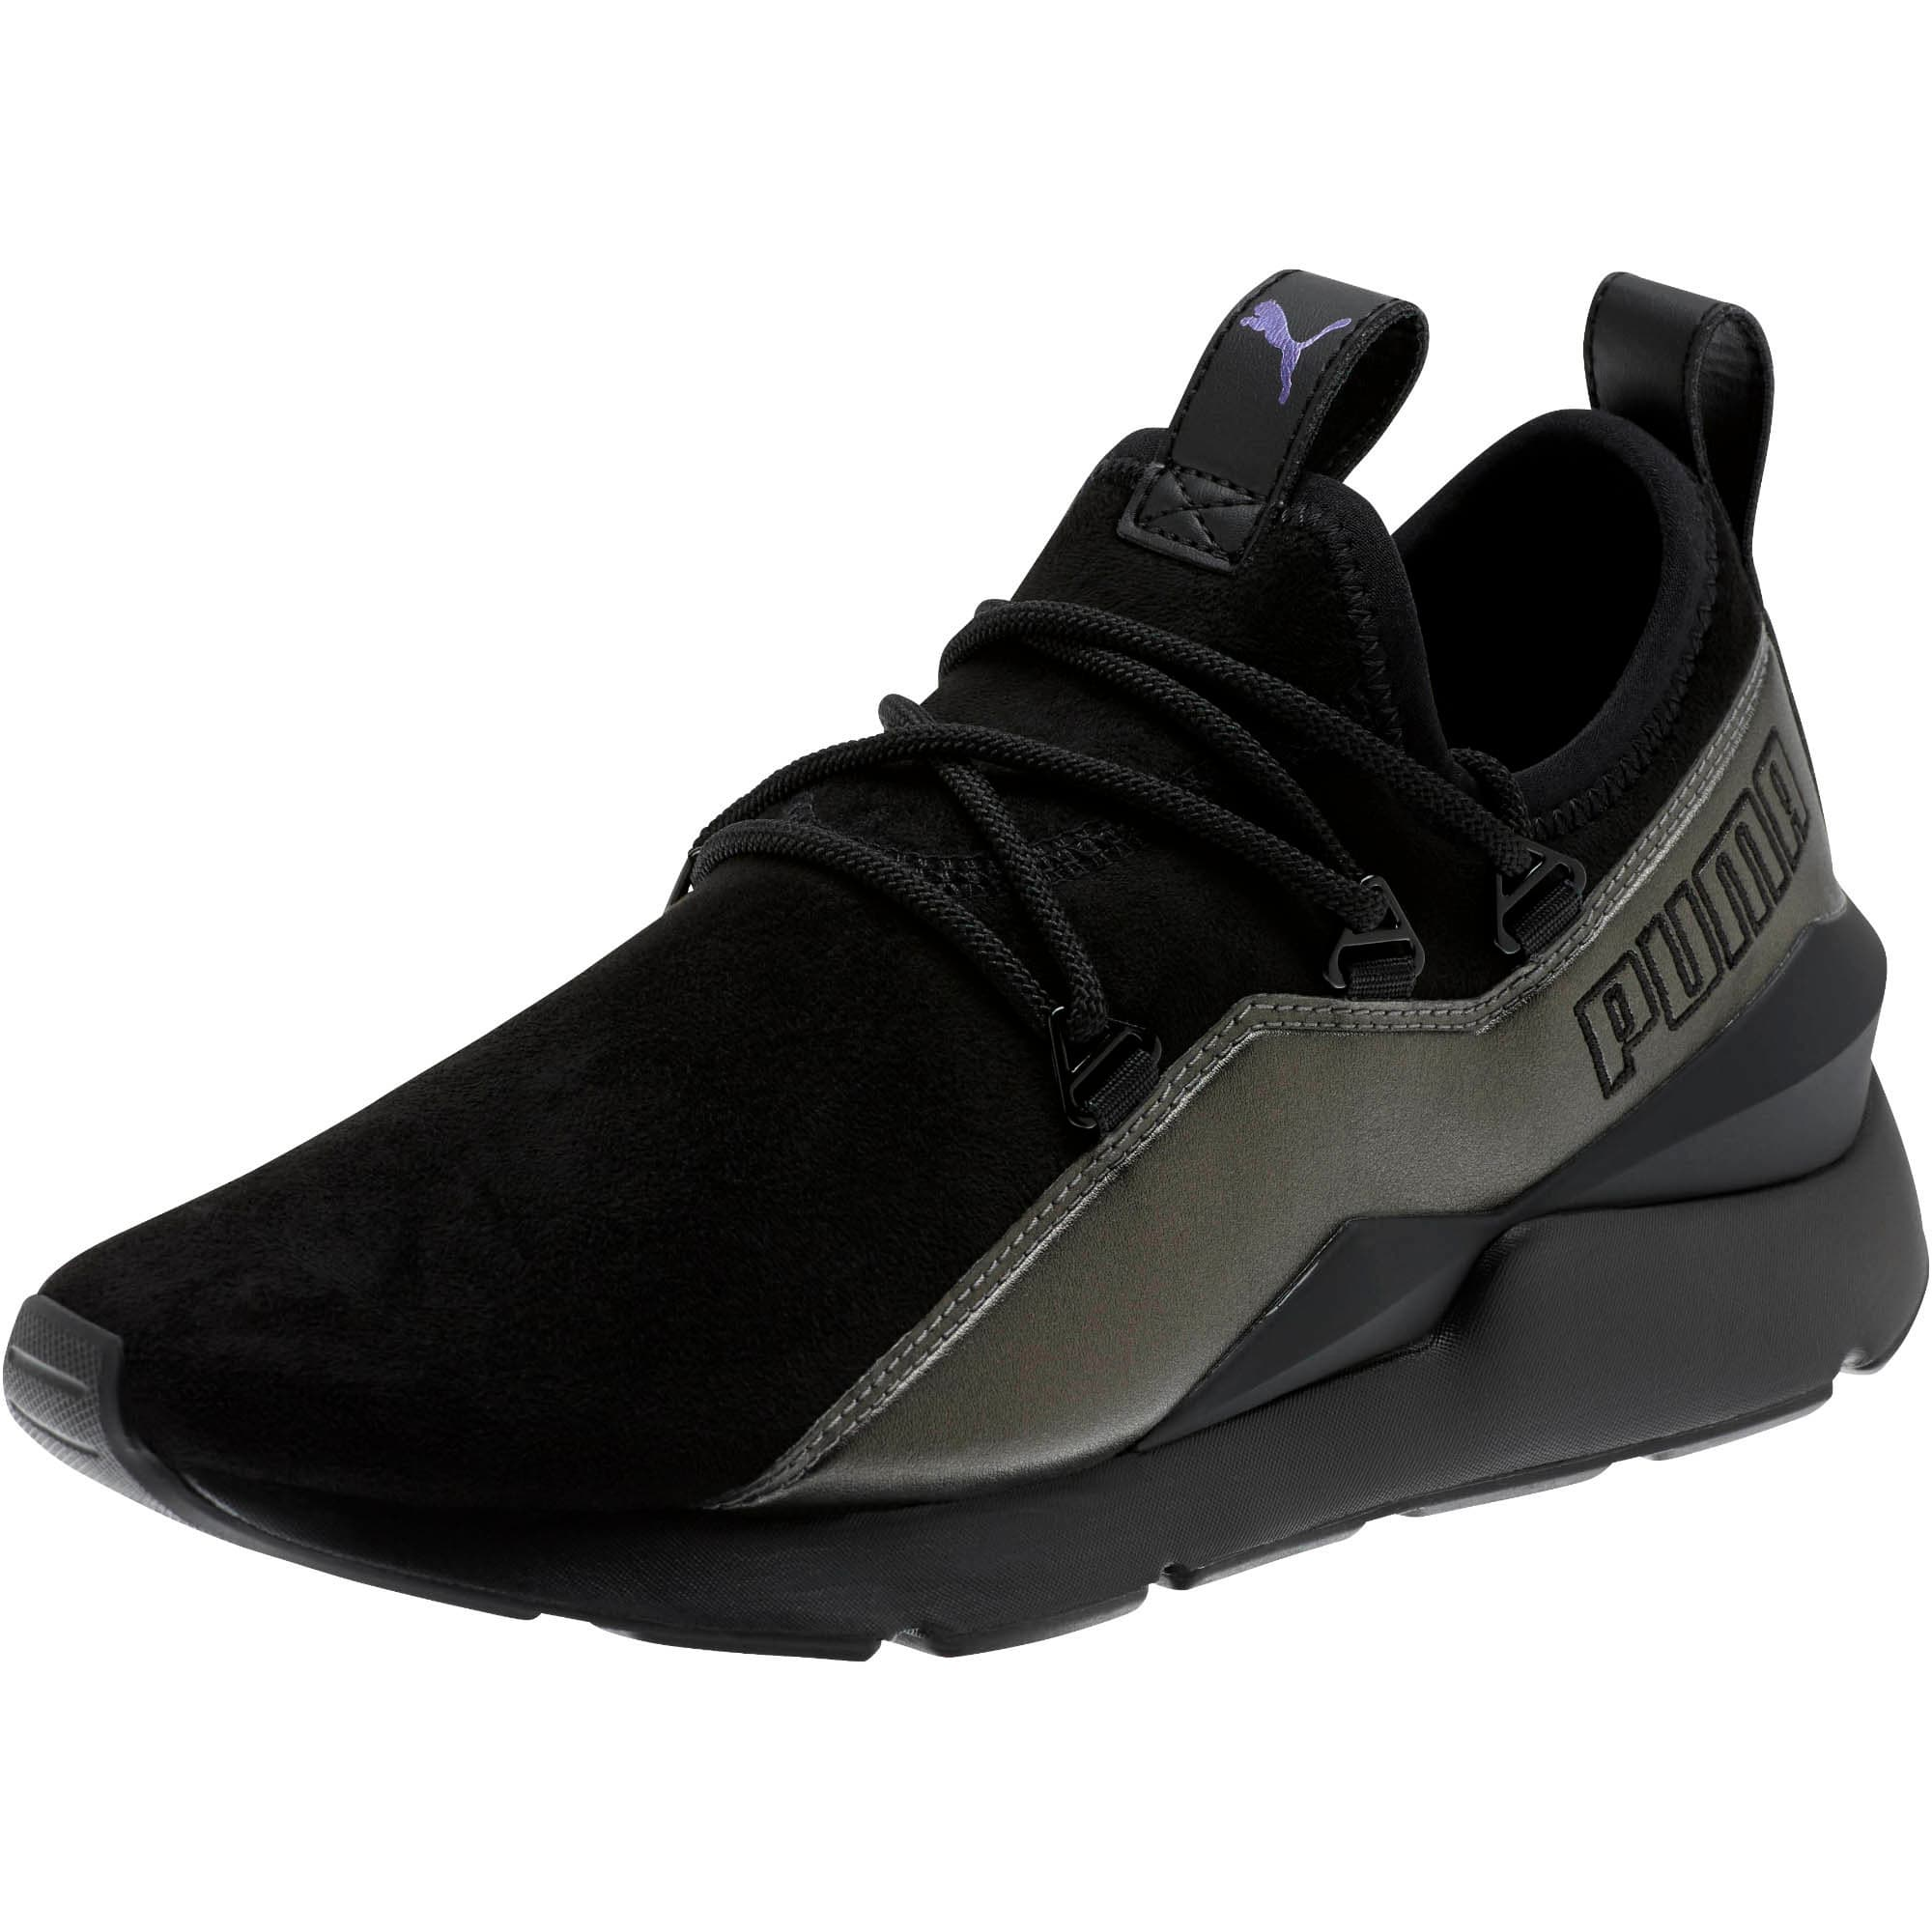 Miniatura 1 de Zapatos deportivosMuse 2 Twilight de mujer, Puma Black-Puma Black, mediano